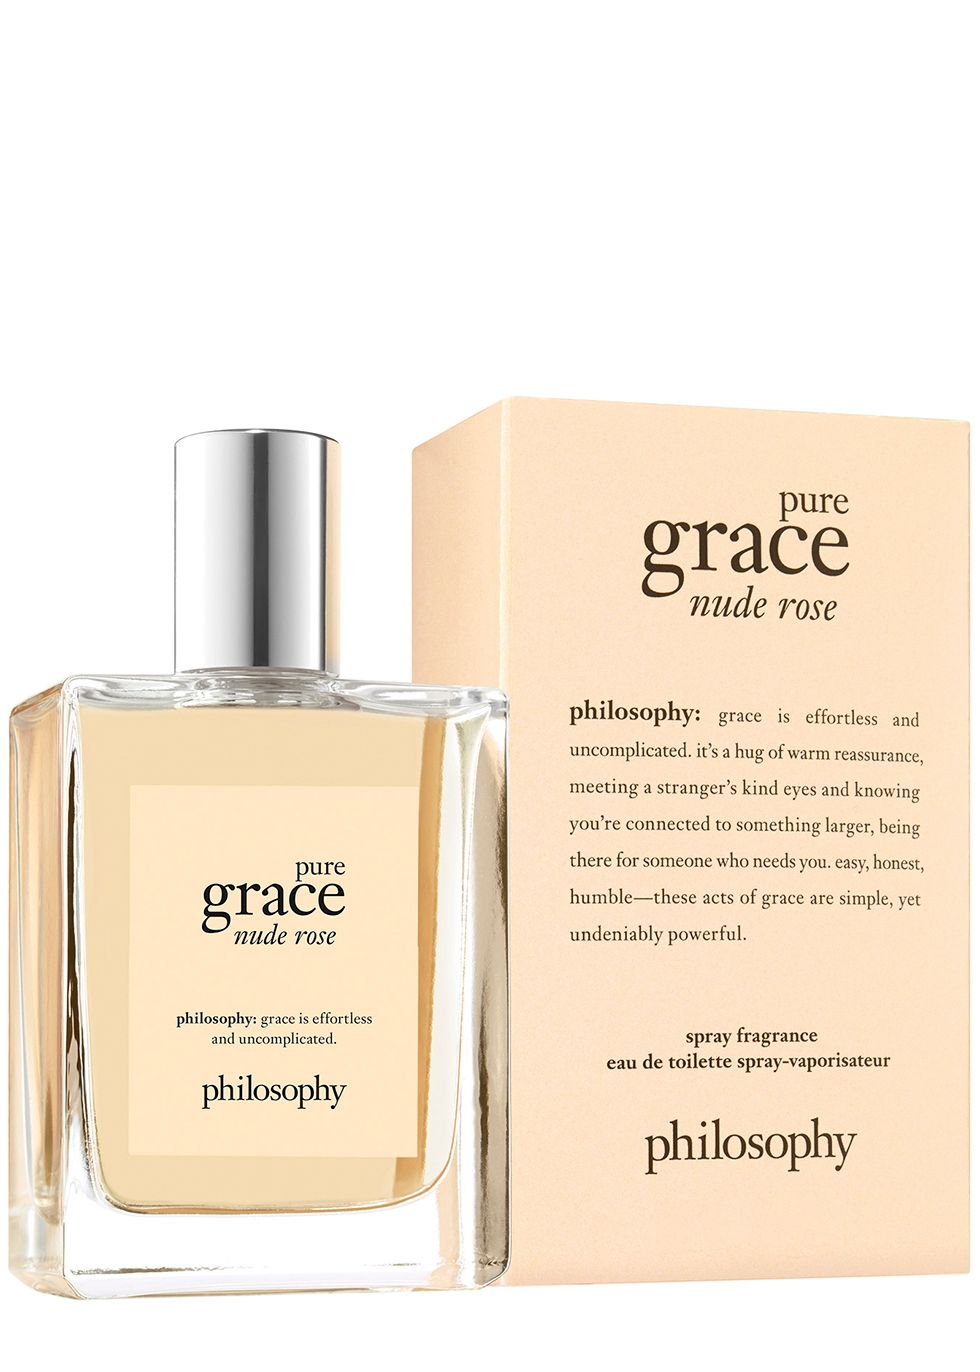 Pure Grace Nude Rose Eau De Toilette 60ml - PHILOSOPHY